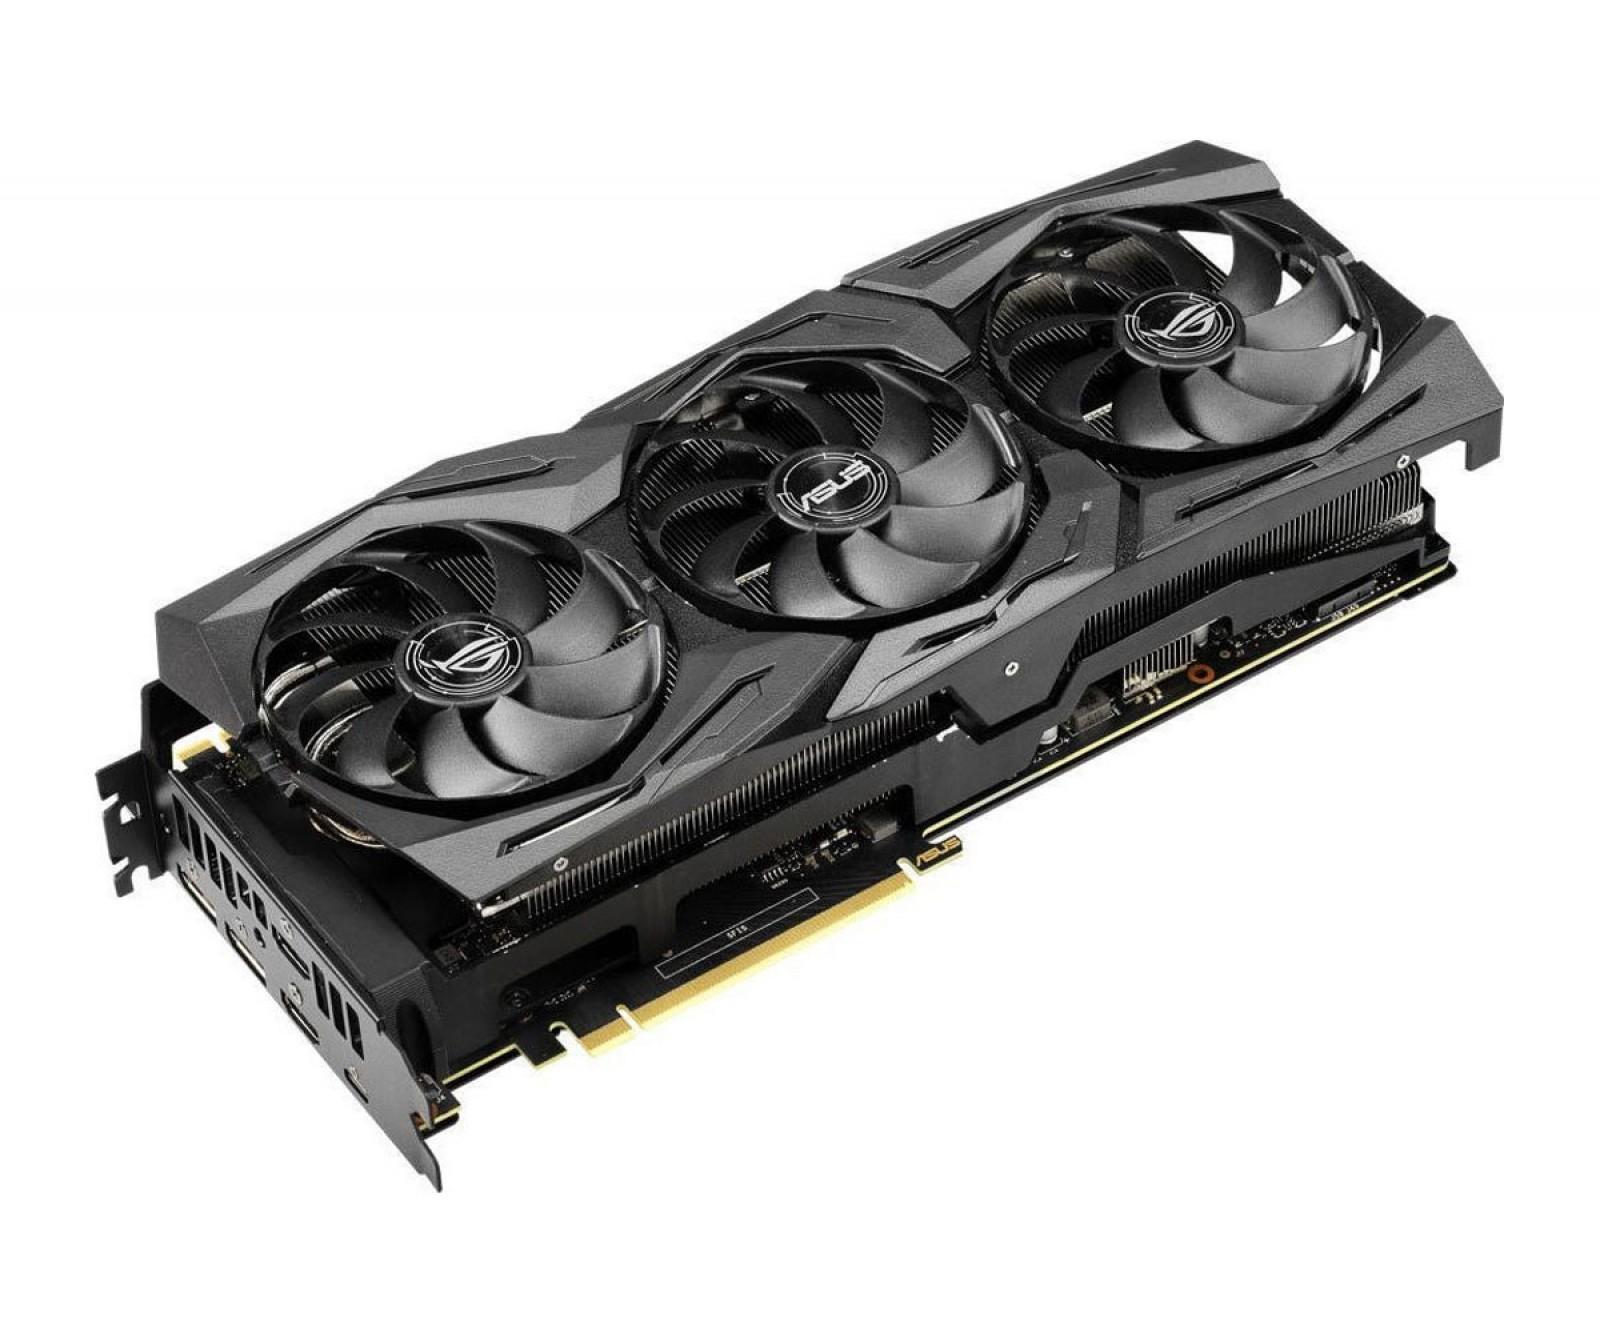 Asus GeForce RTX 2080 Ti 11GB ROG Strix Advanced Gaming